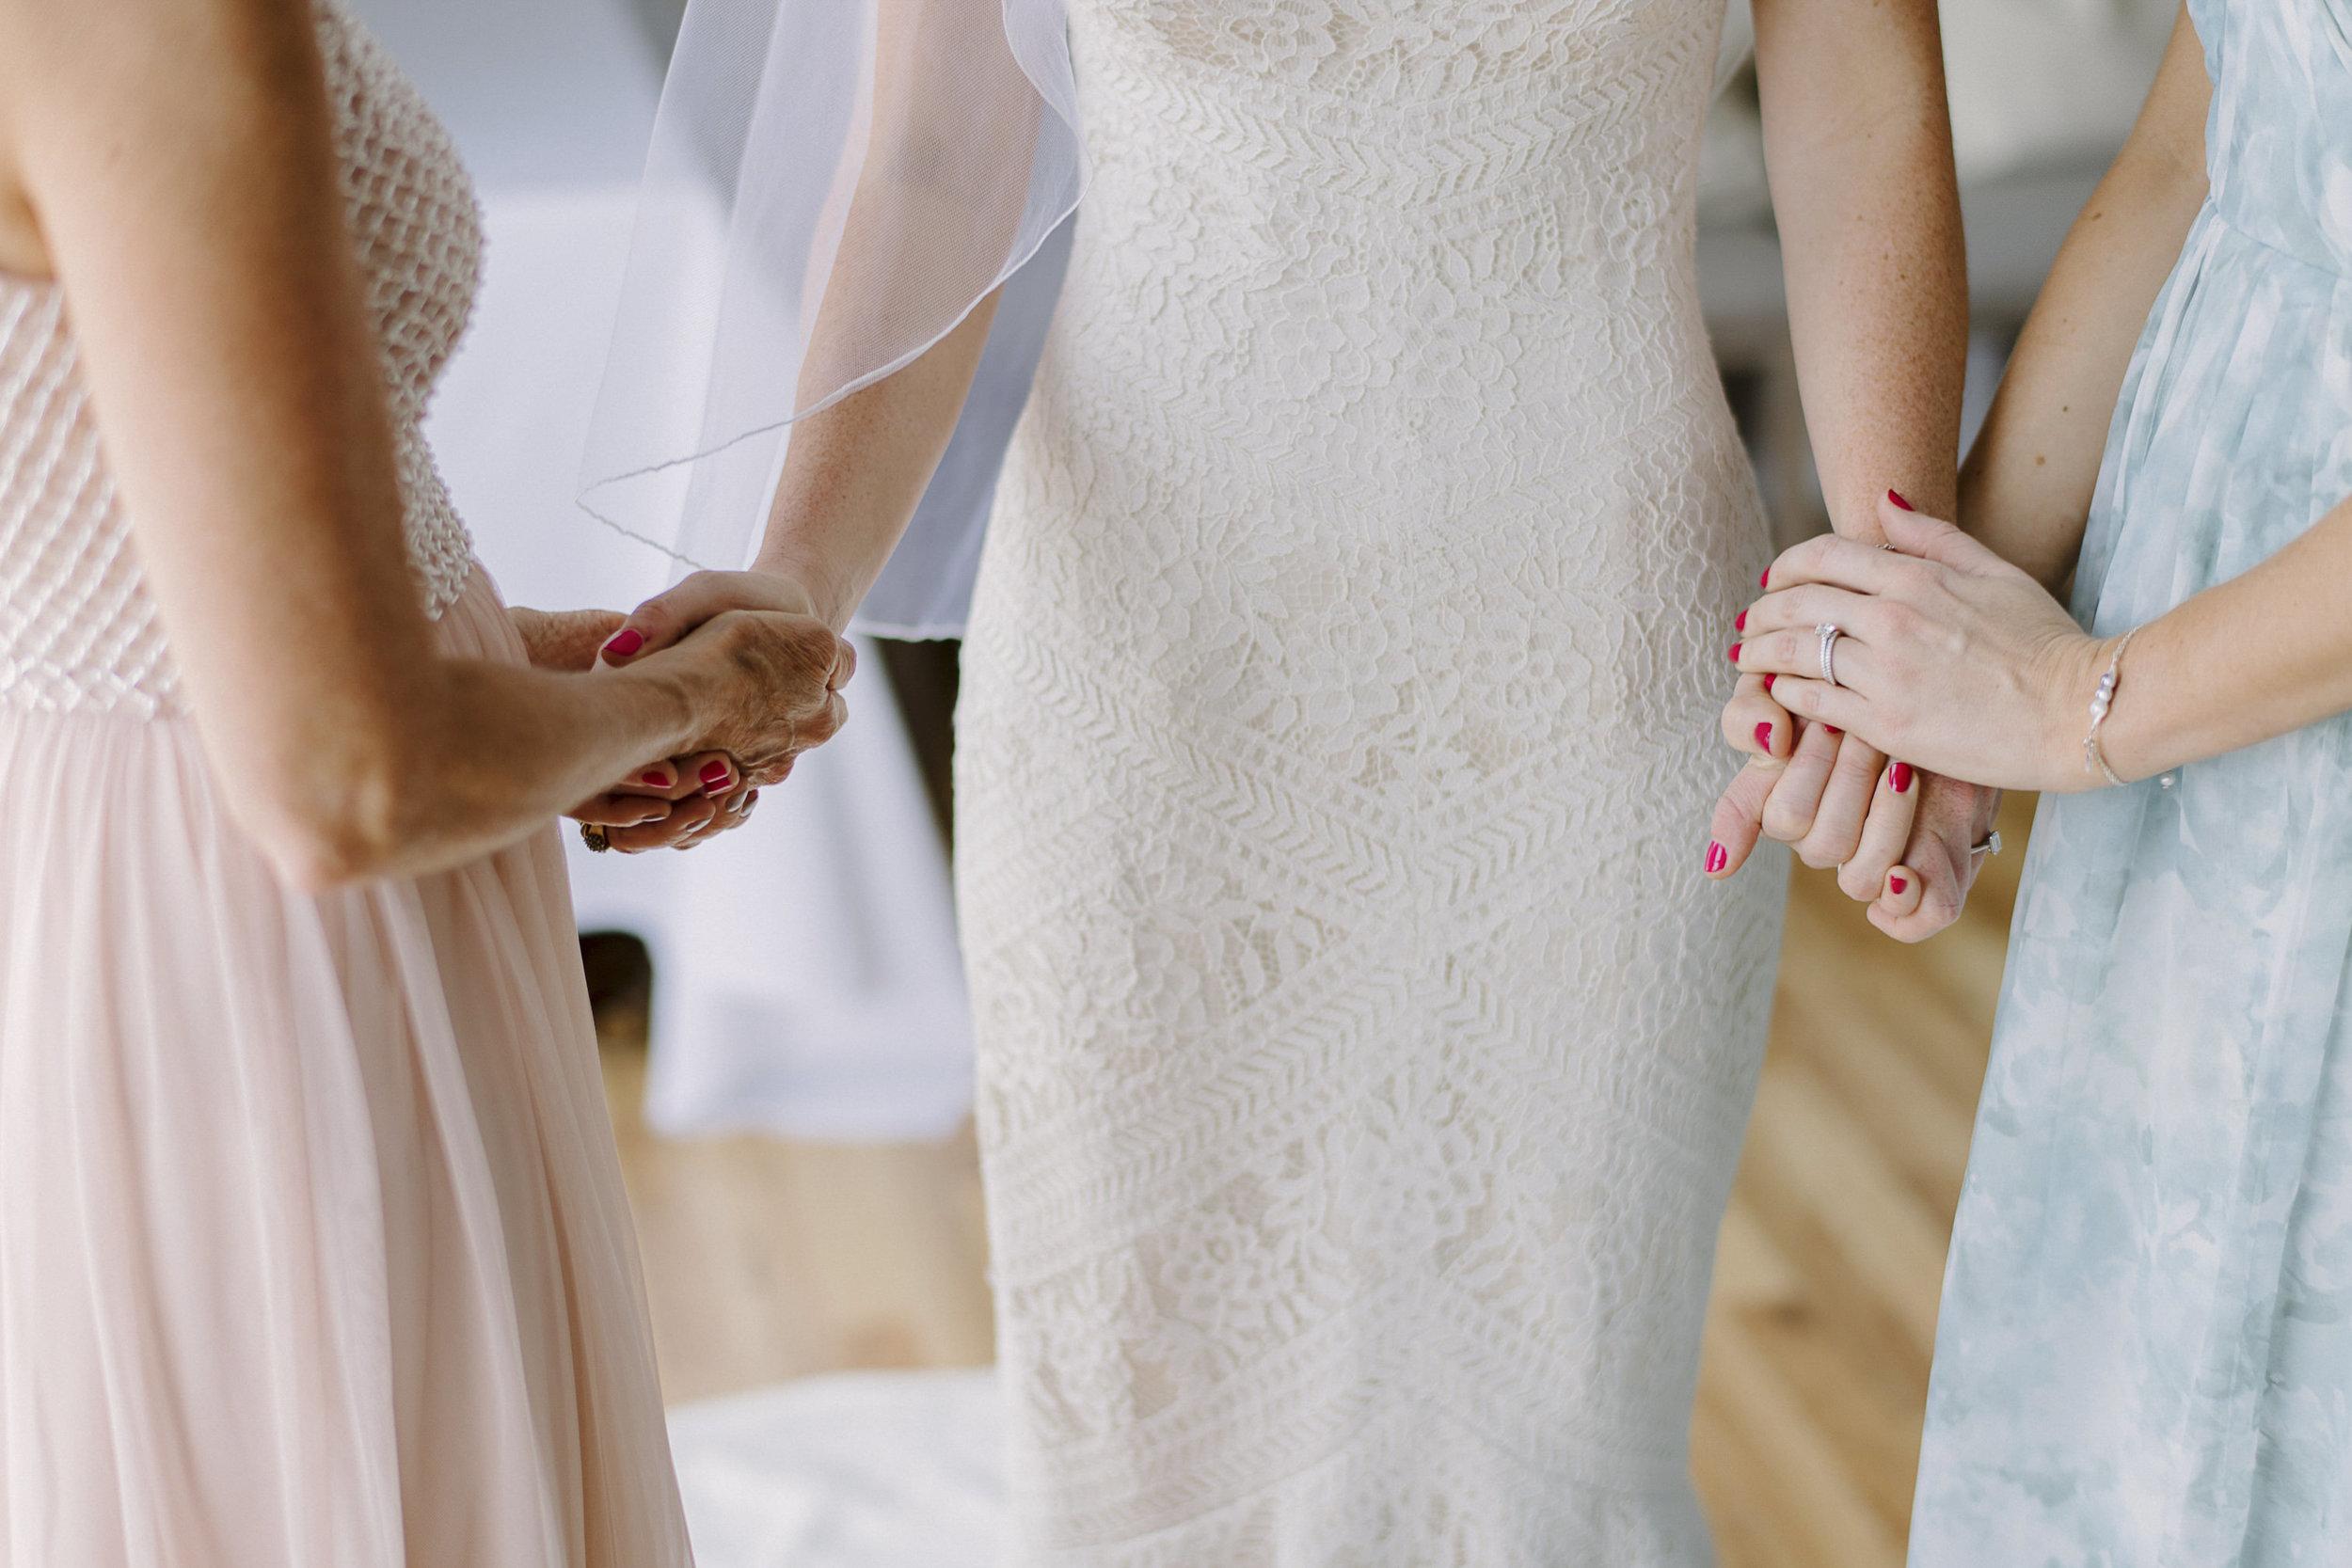 Carlouel Yackt & Beach Club Wedding Sunglow Photography